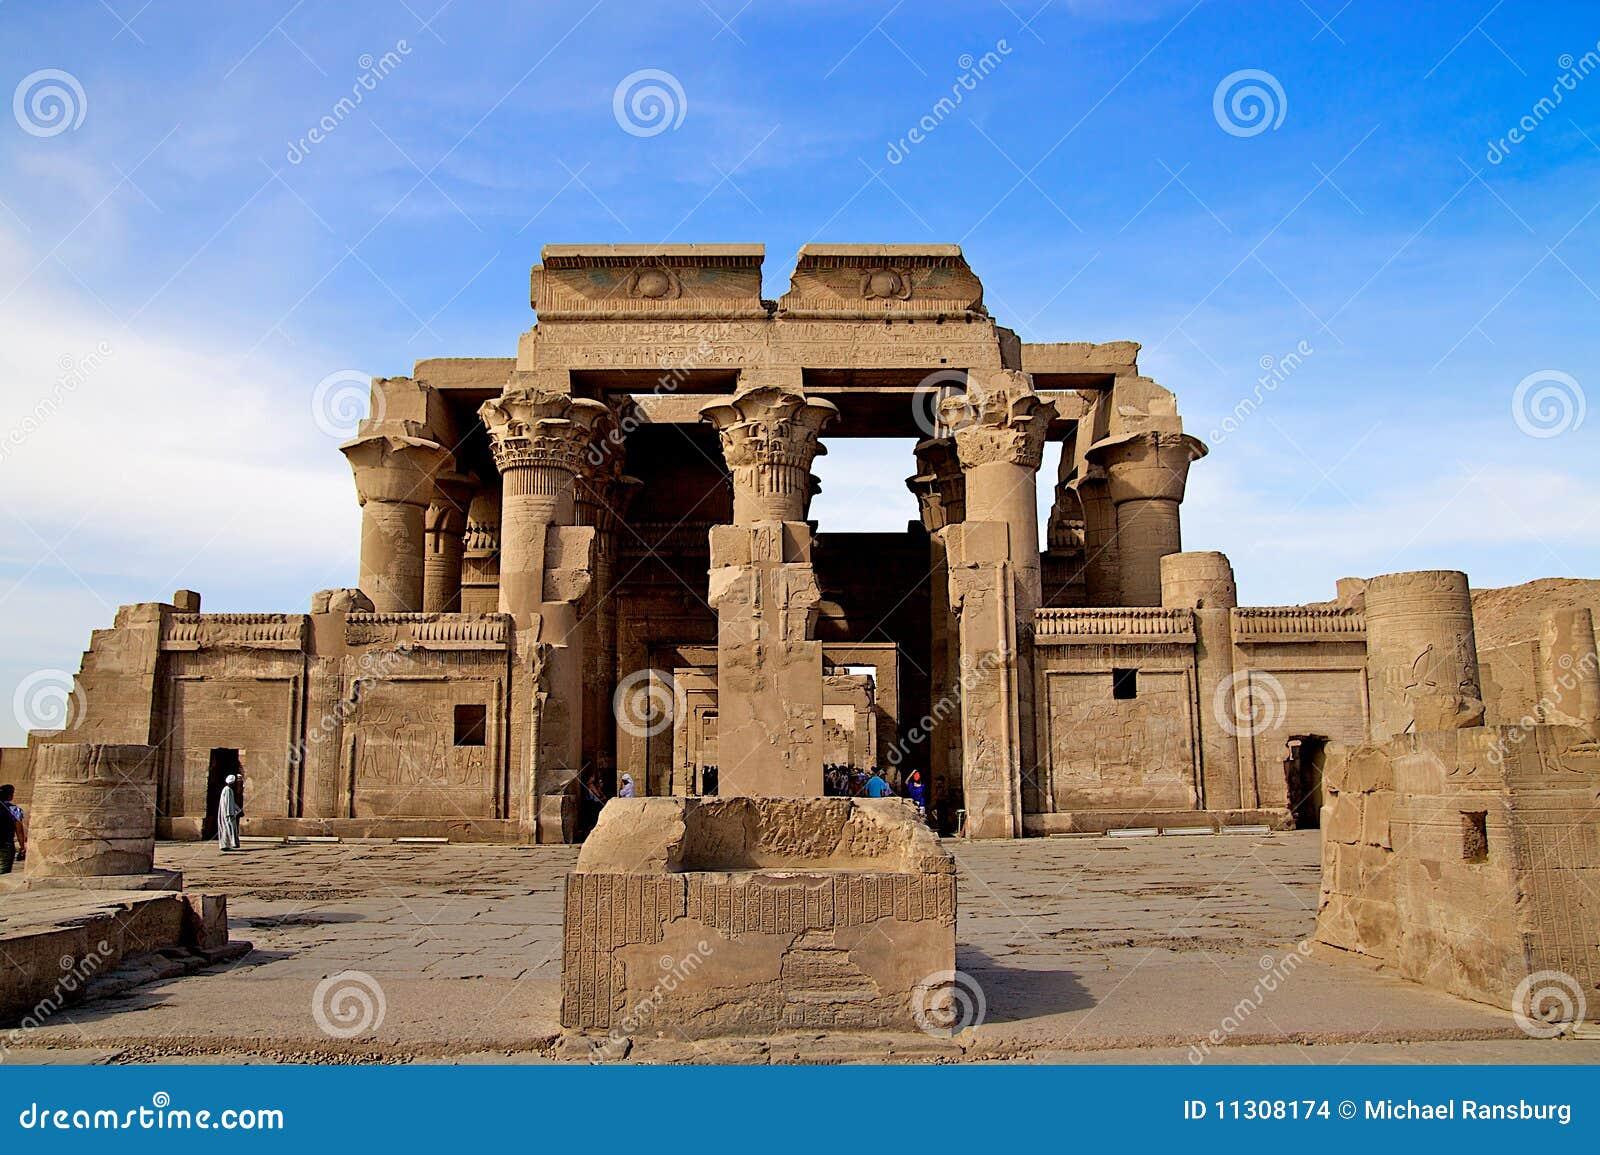 Architect ancient egypt